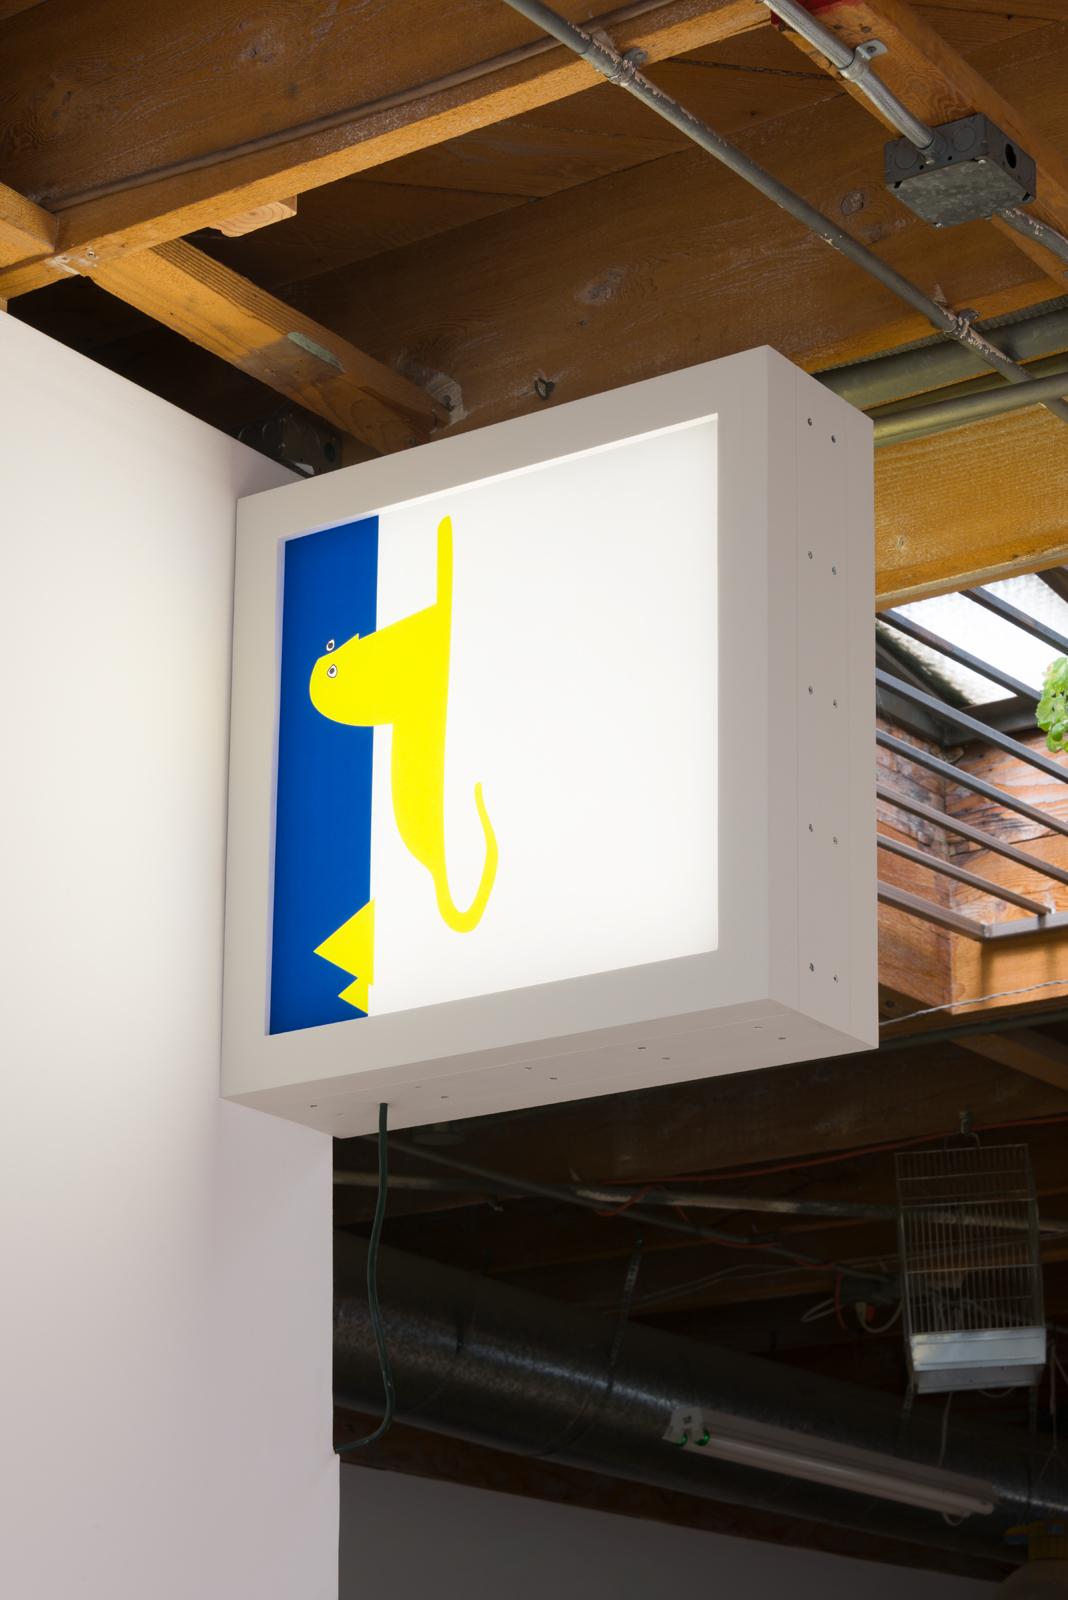 Ryan Fenchel  Aquemini / Leo Version, 2016 double sided electric light box (LED, acrylic paint, plexiglass, and wood) 26 x 26 x 9 in.